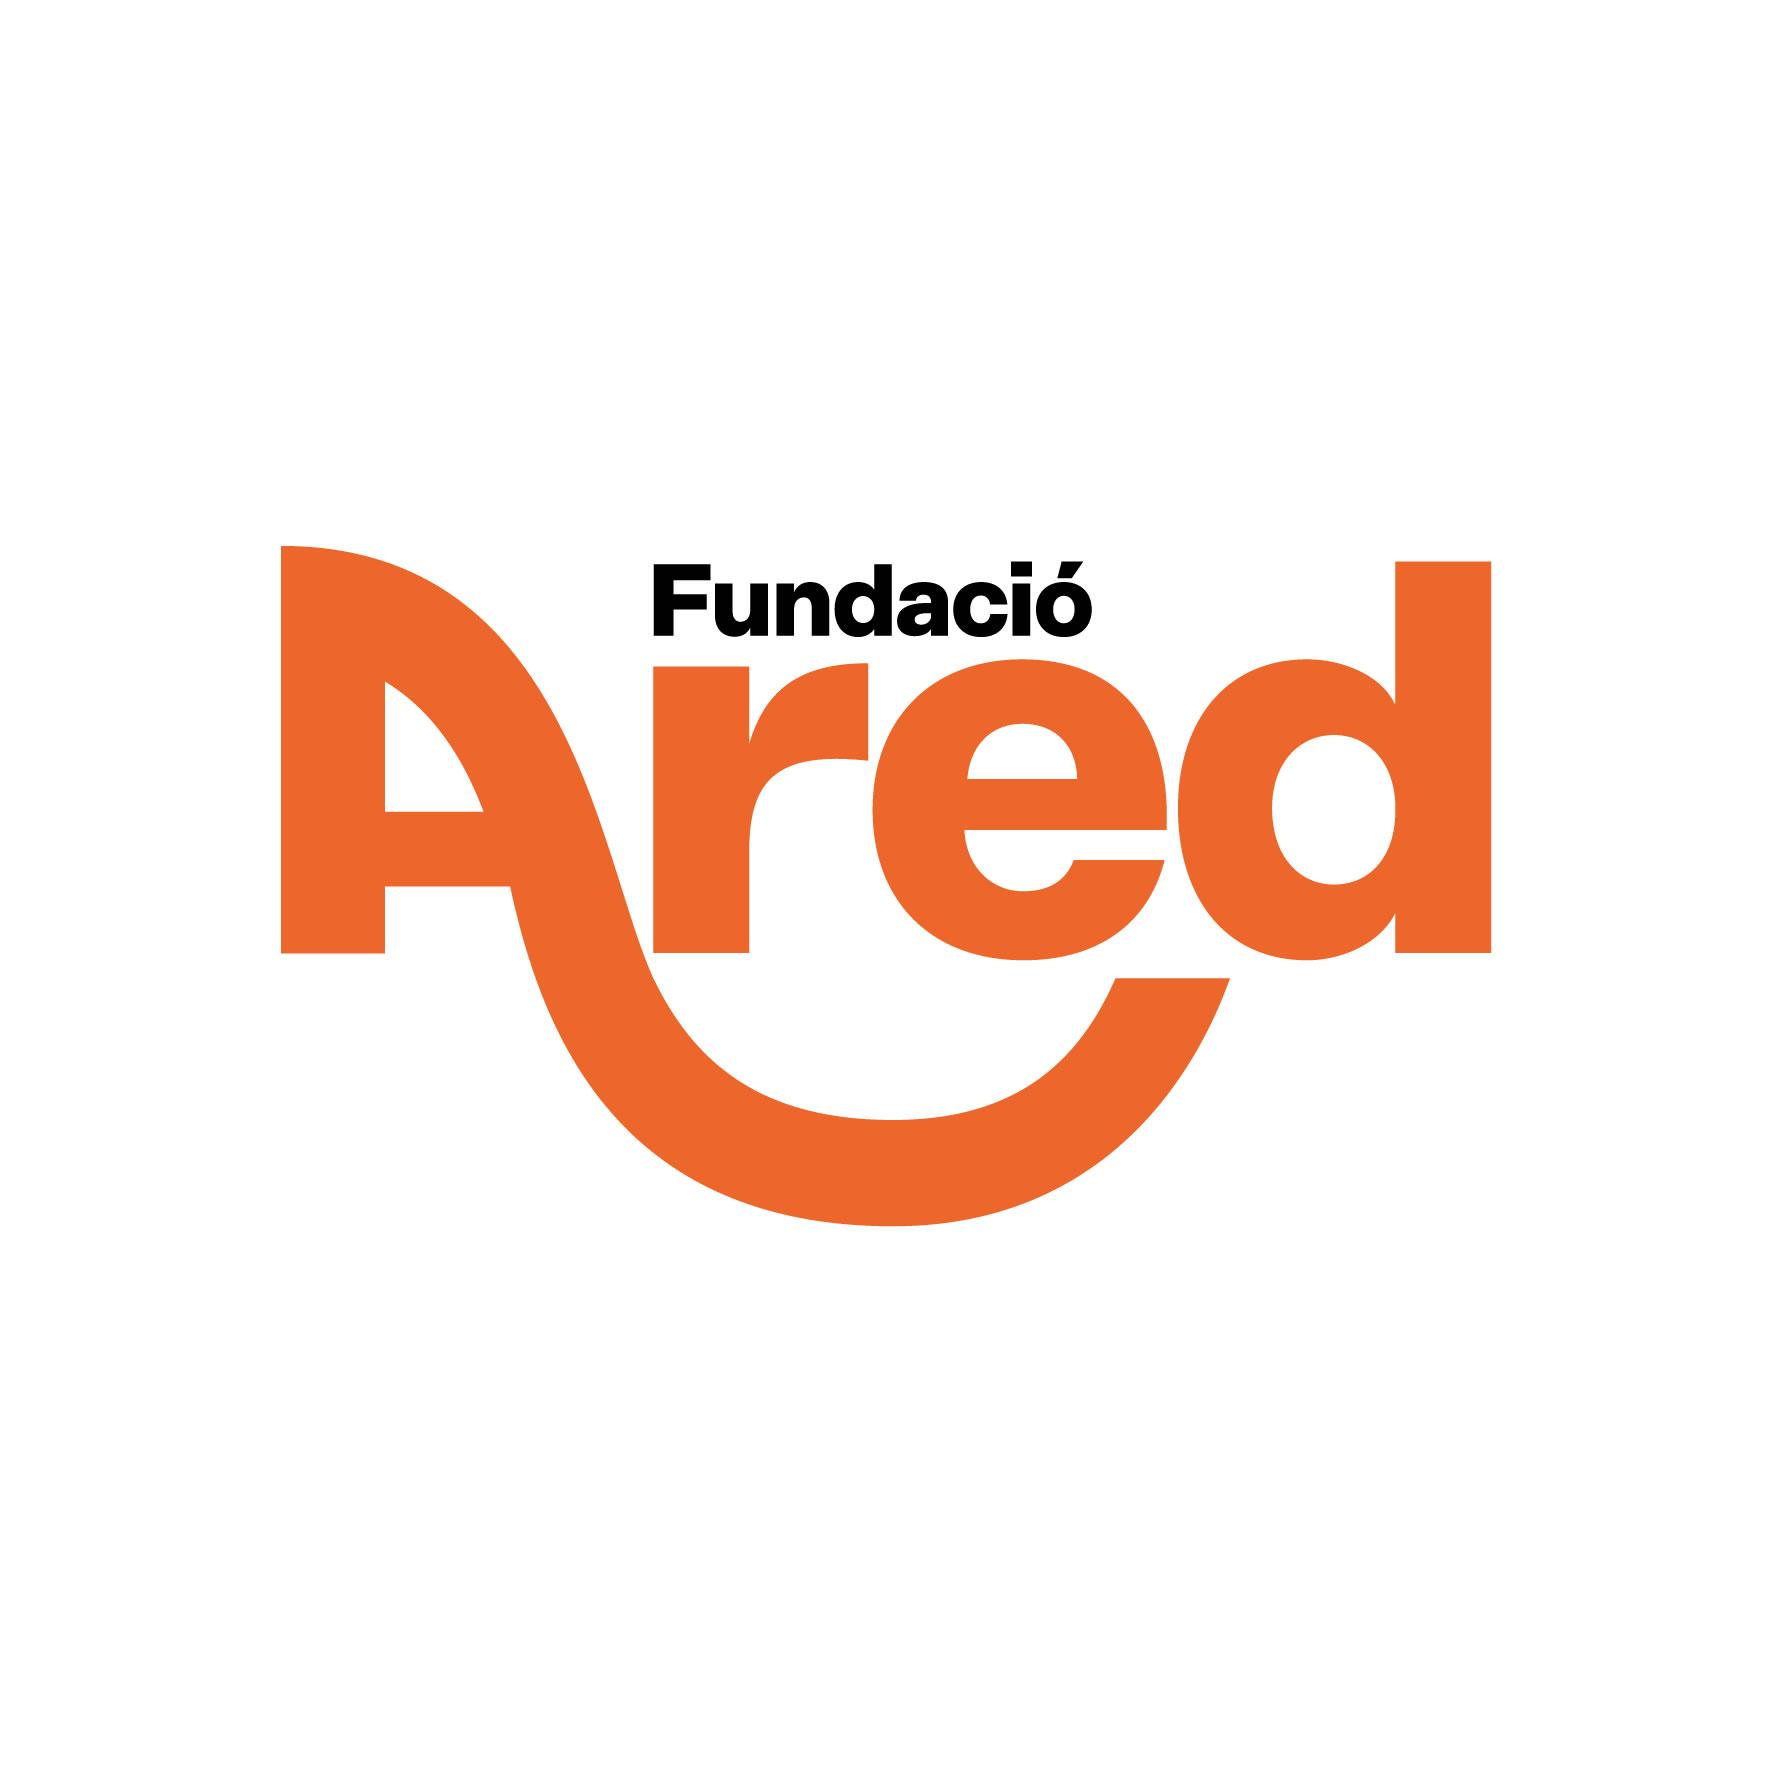 Ared, Fundación